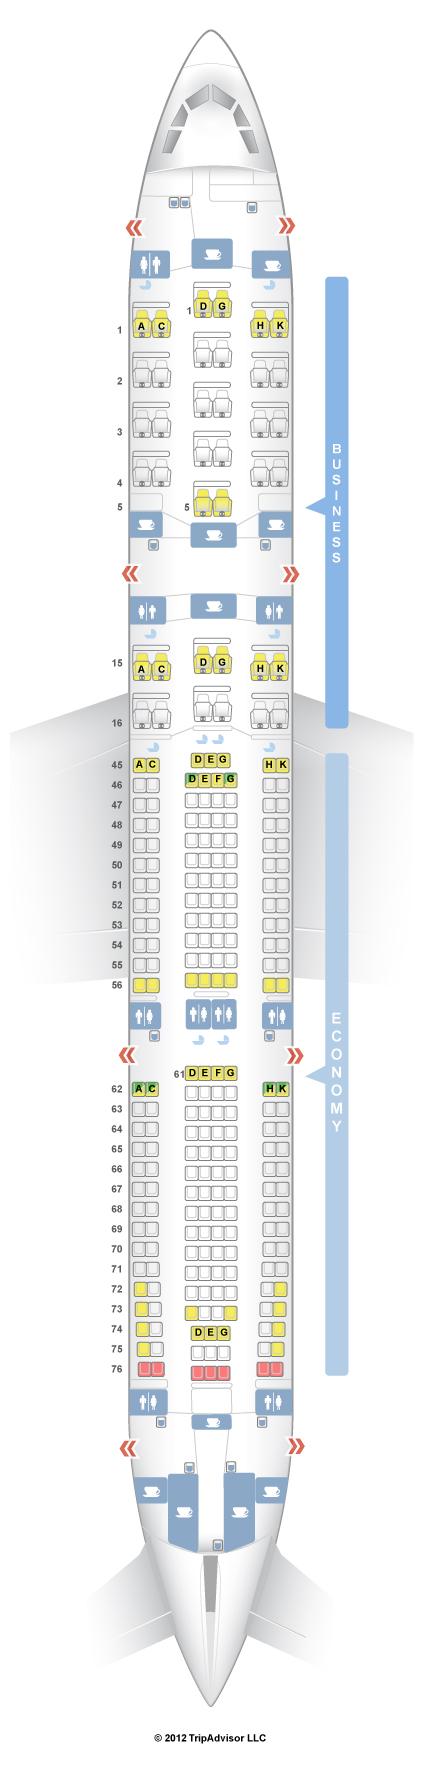 SeatGuru Seat Map South African Airways - SeatGuru